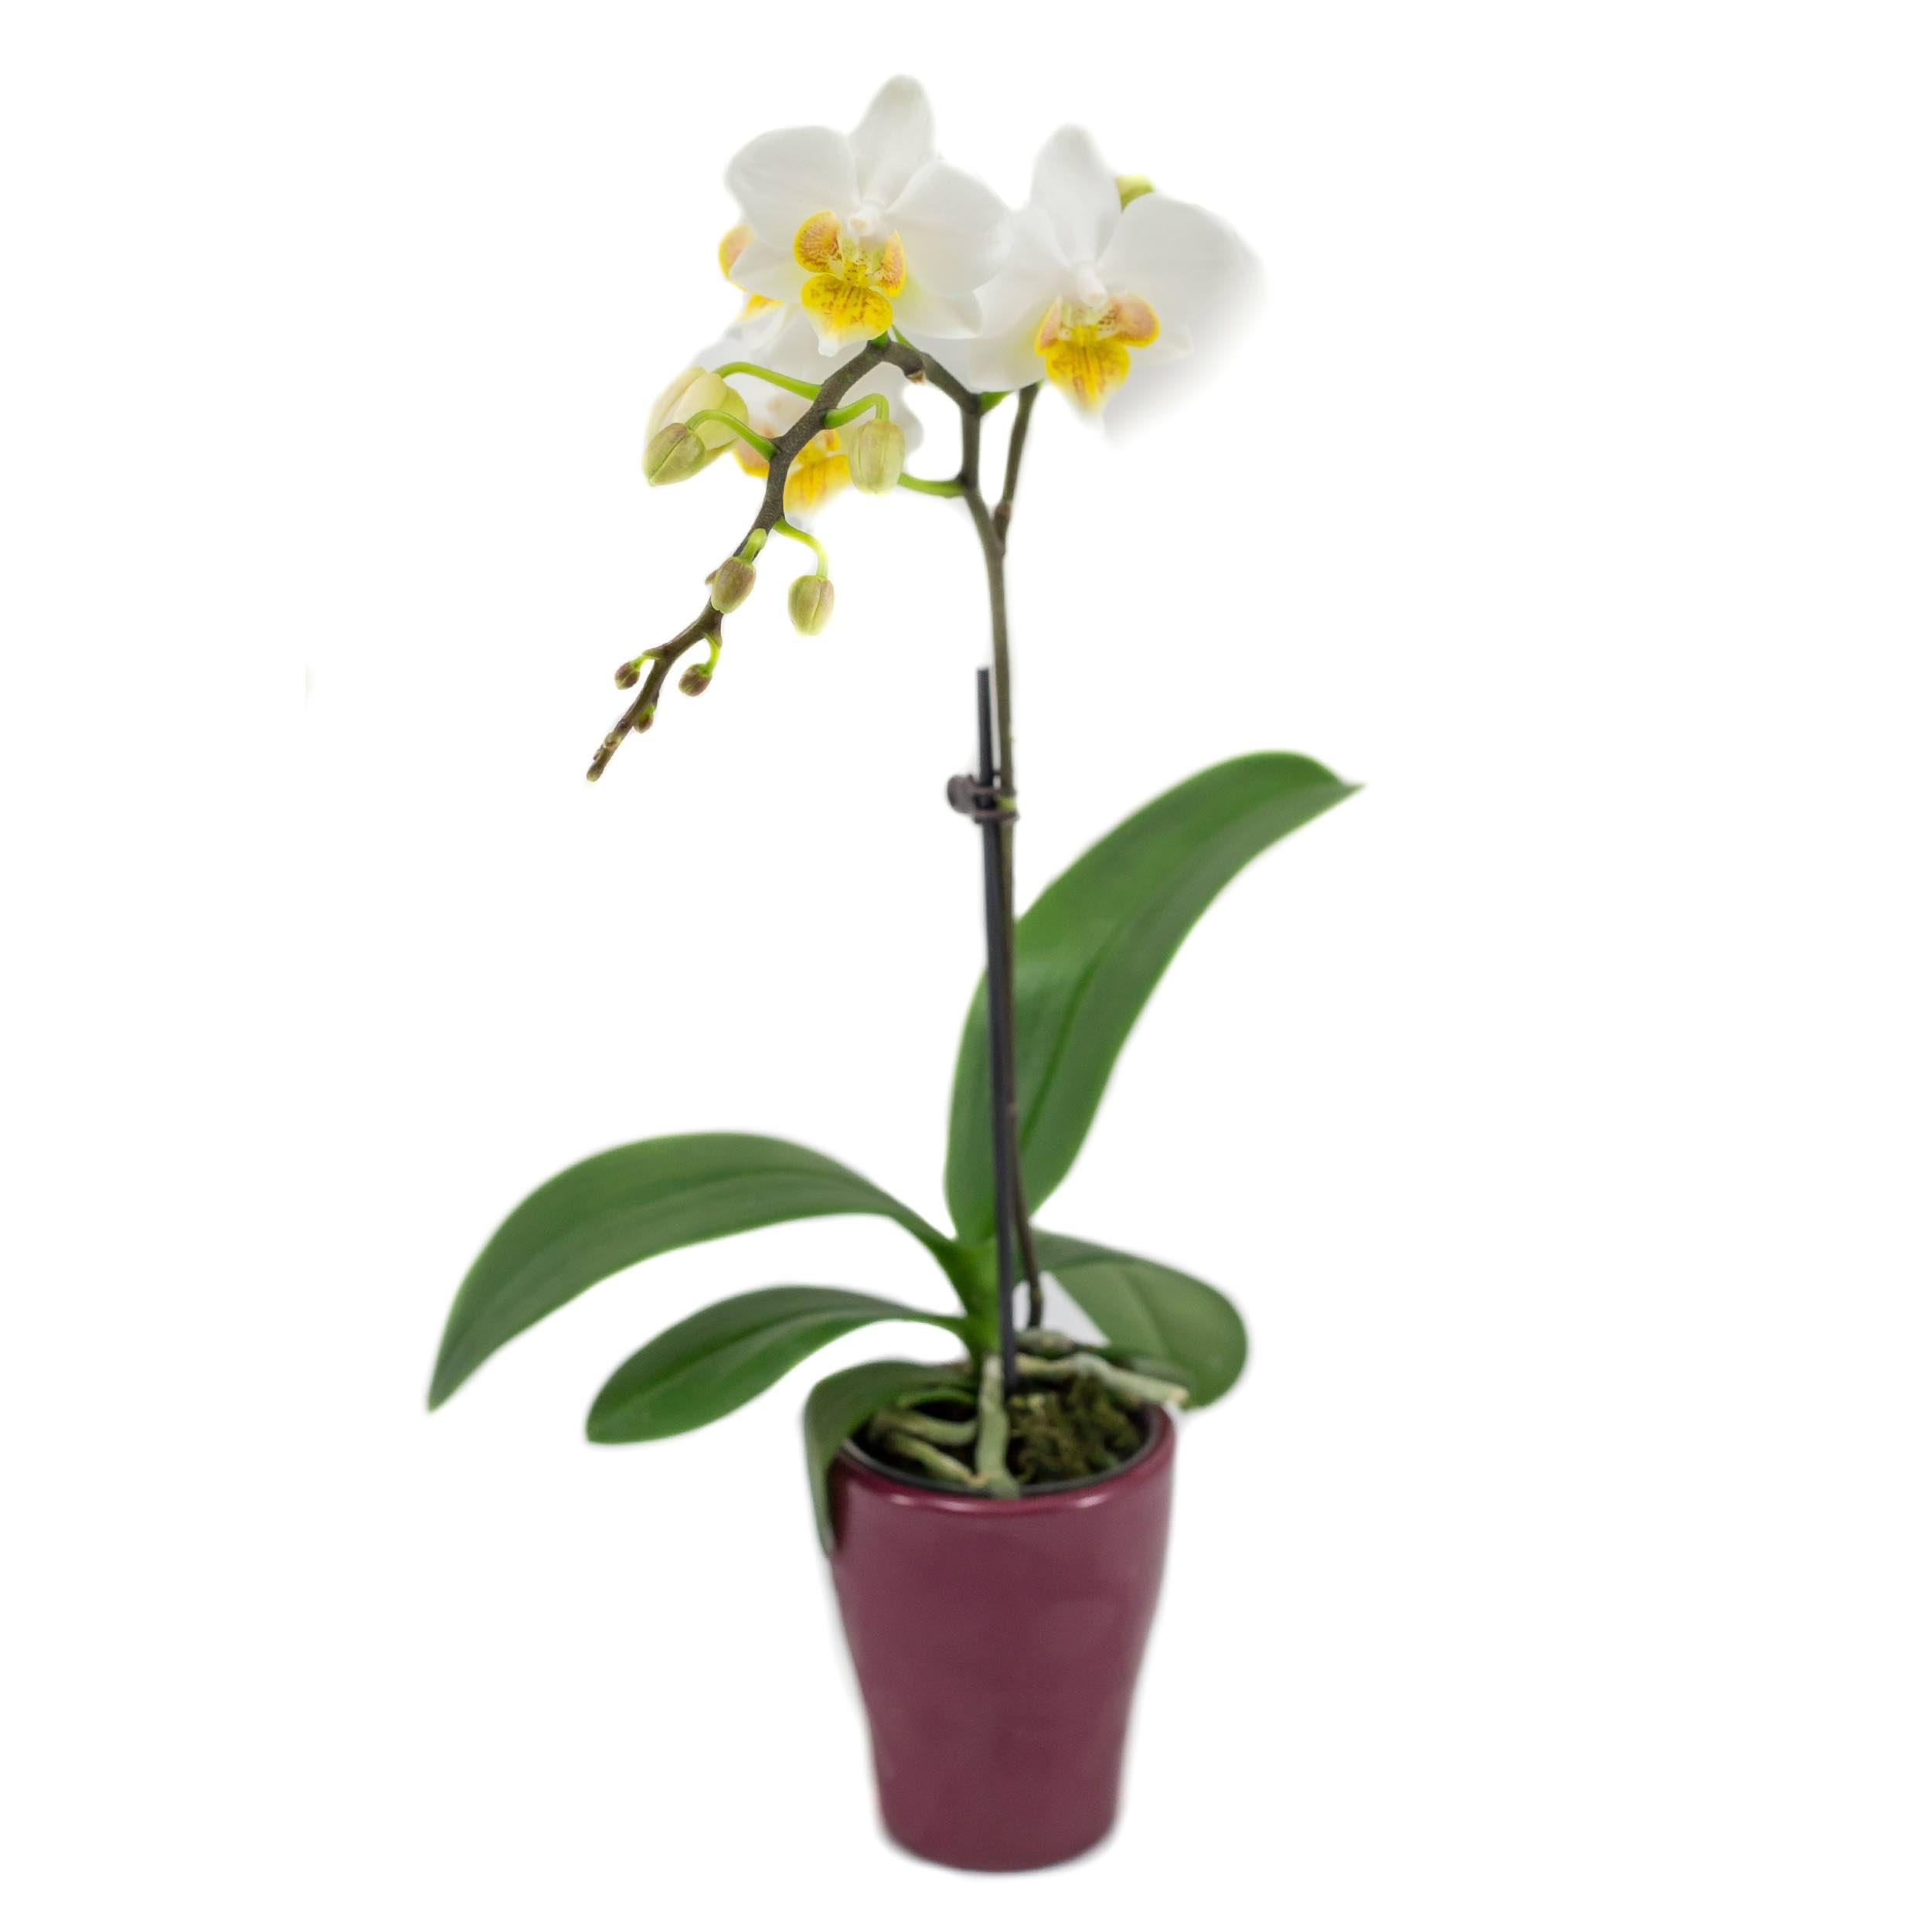 Phalaenopsis blanche (2 hampes, 25 cm)